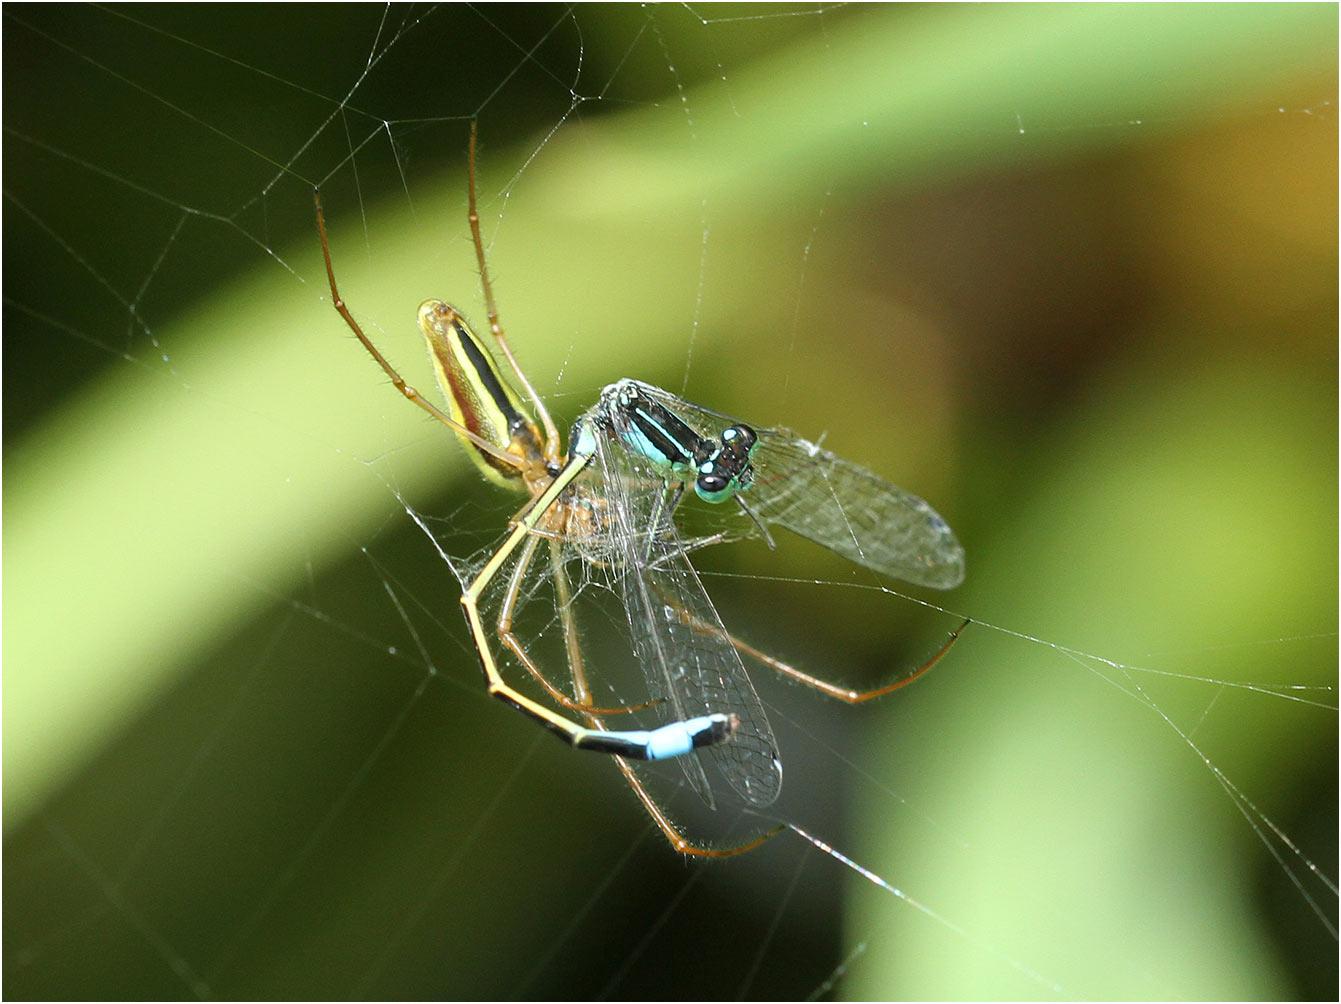 Ischnura elegans mâle piégé par Tetragnatha extensa, Beaupréau (France - 49), 24/06/2013